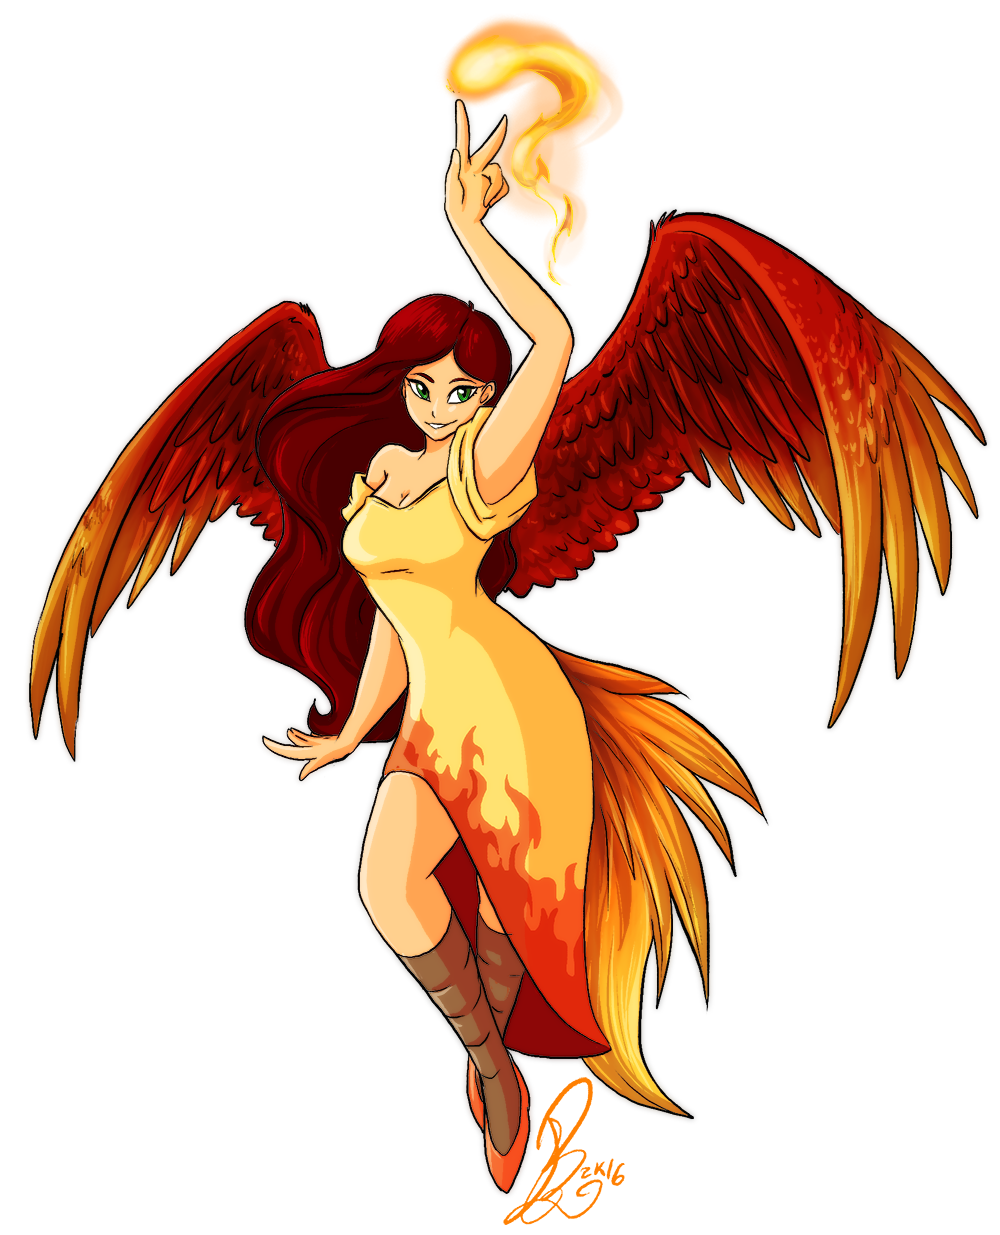 freeuse download pheonix drawing woman phoenix #101203360